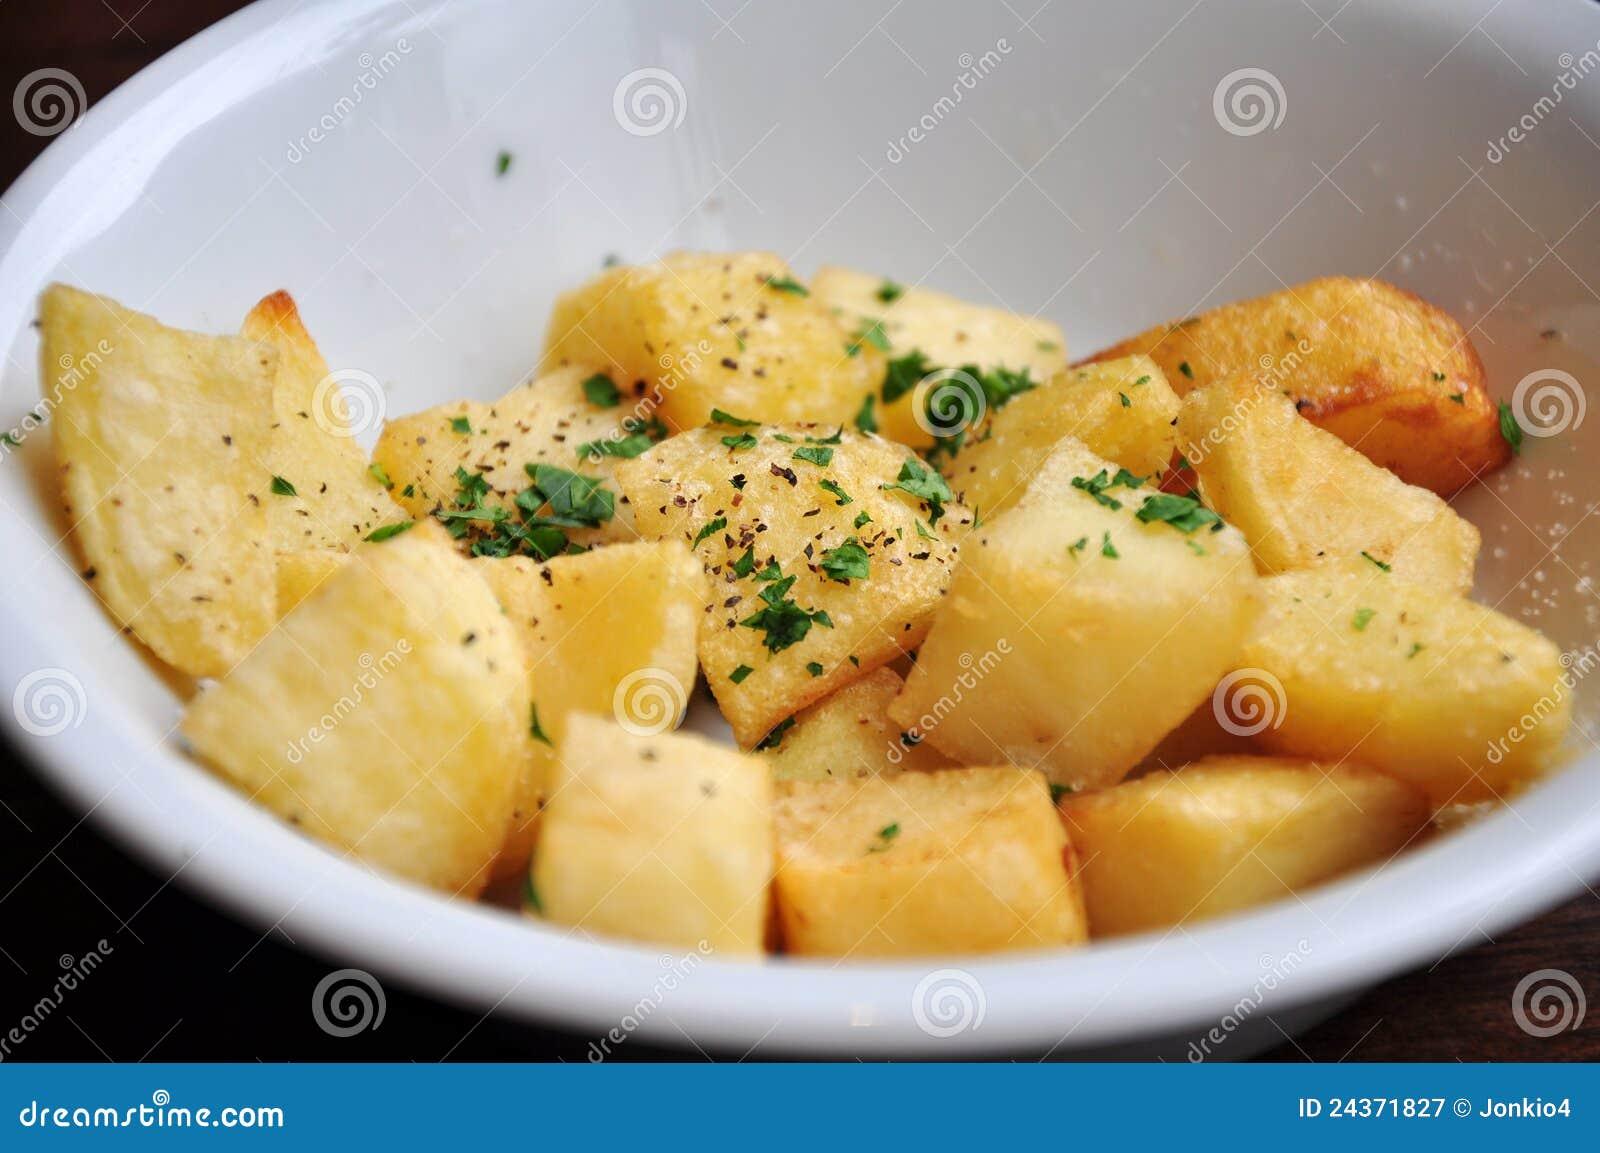 Mustard Roast Potatoes Royalty Free Stock Photography ...